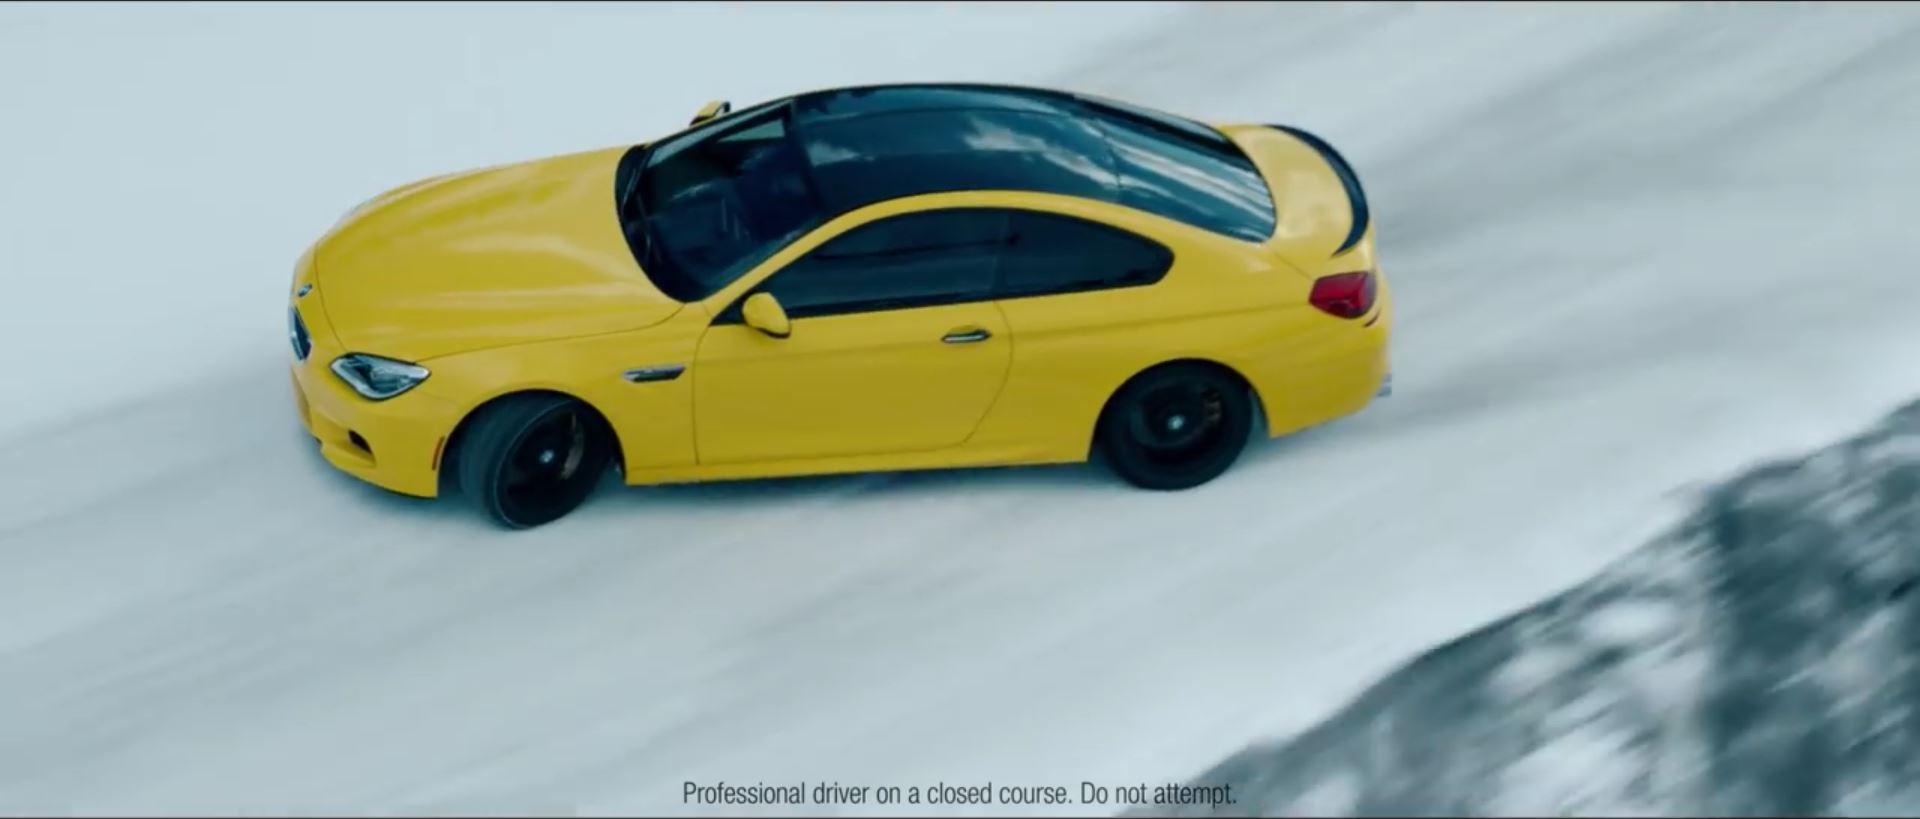 BMW M6 Pennzoil